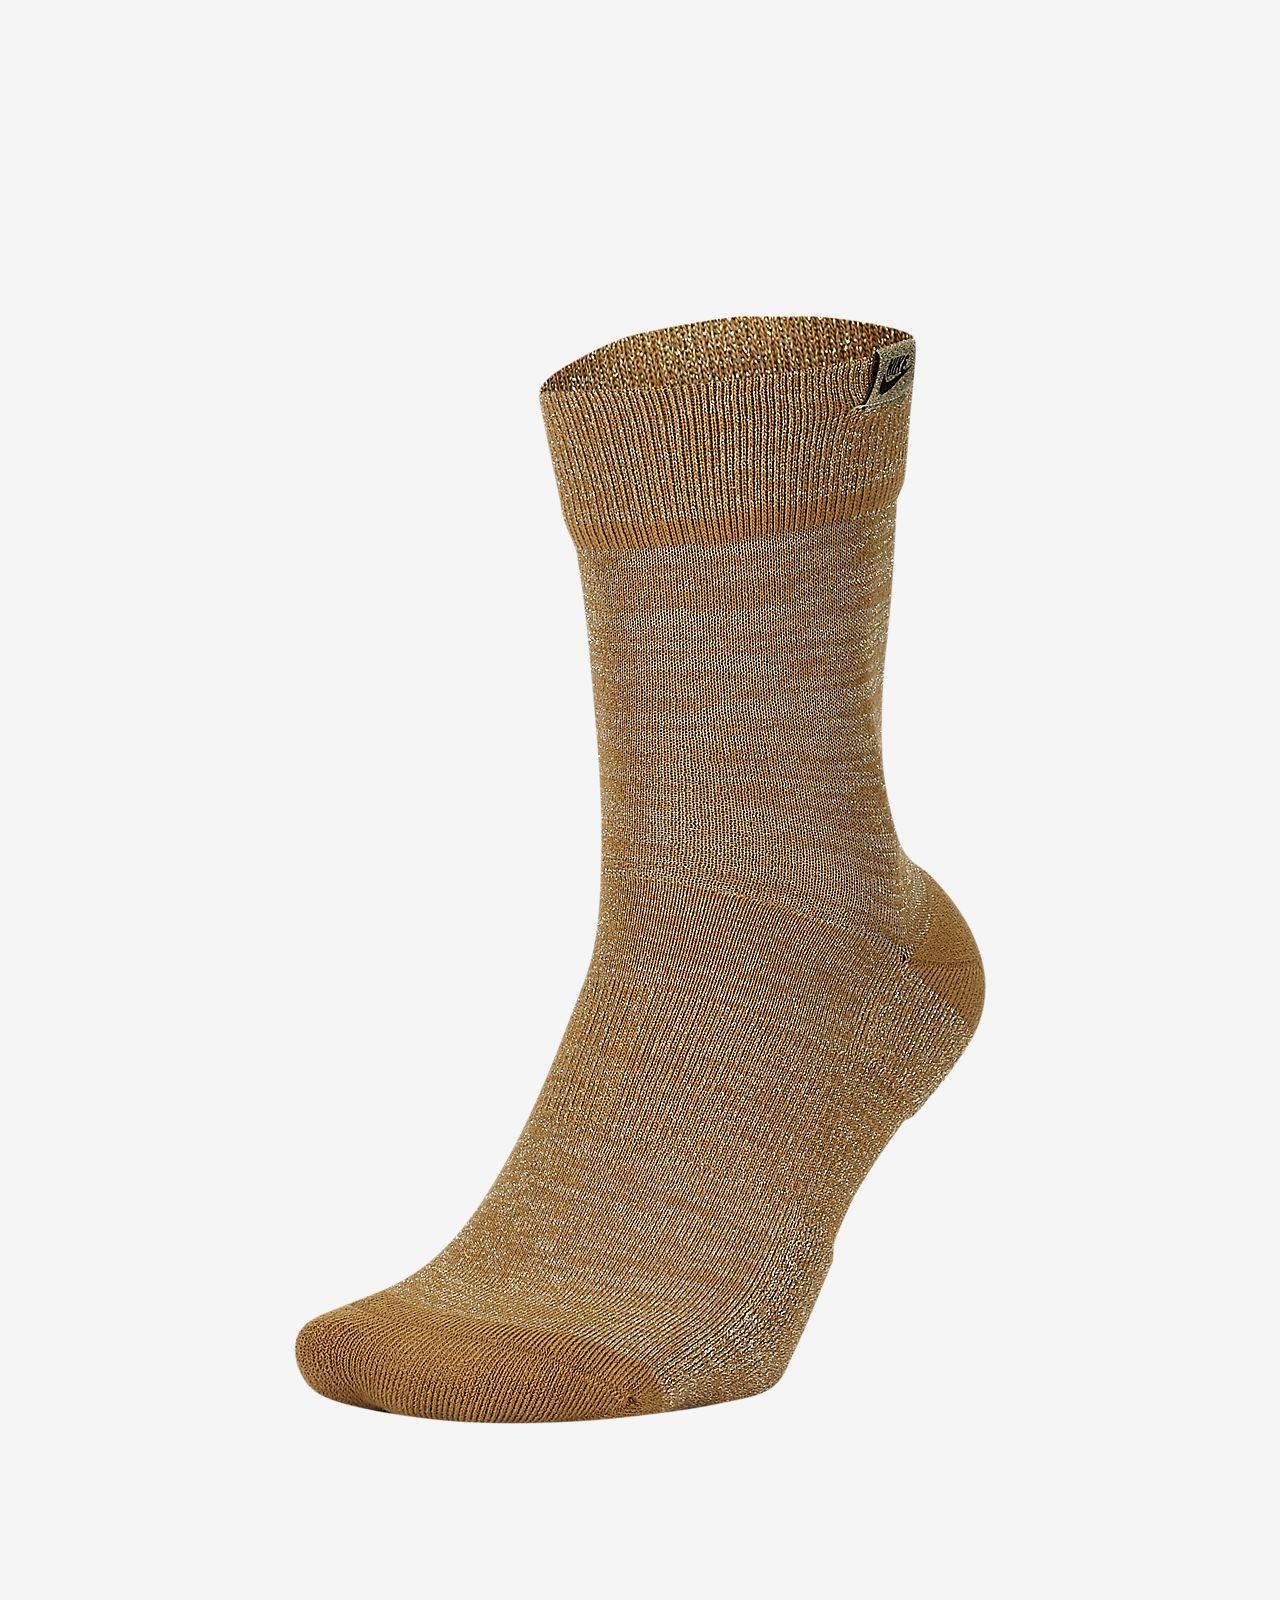 Nike SNEAKR Sox Metallic Crew sokken